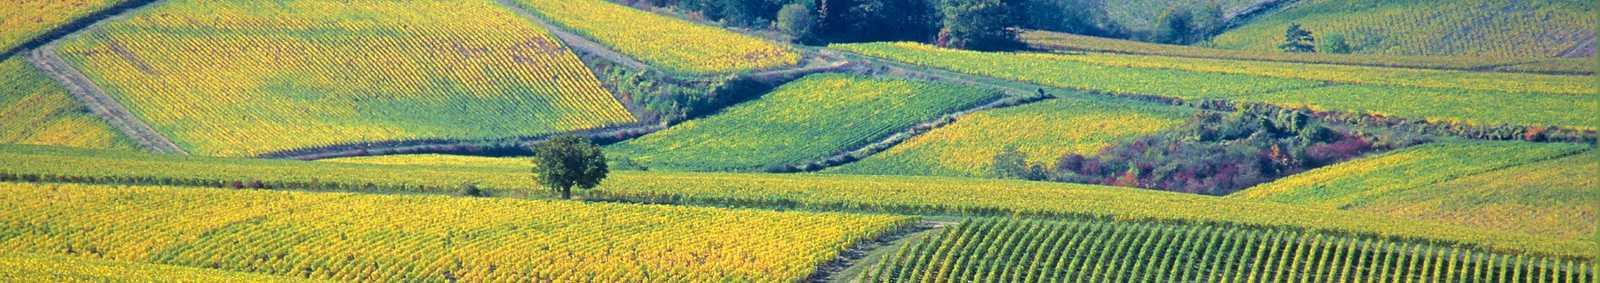 chablis-vineyard